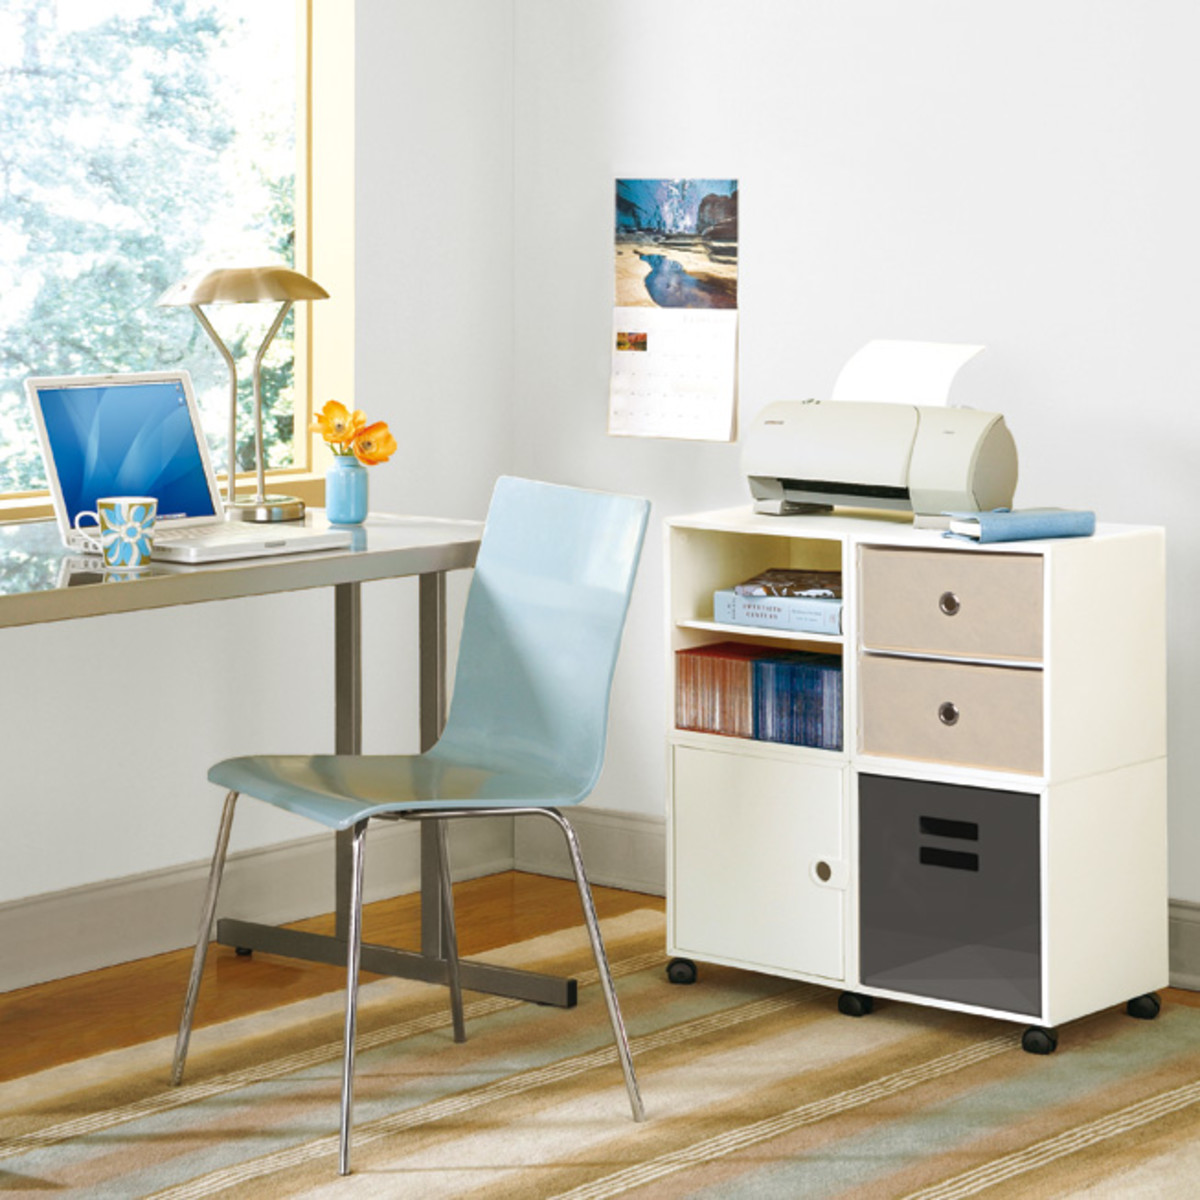 Office-cube-modular-system